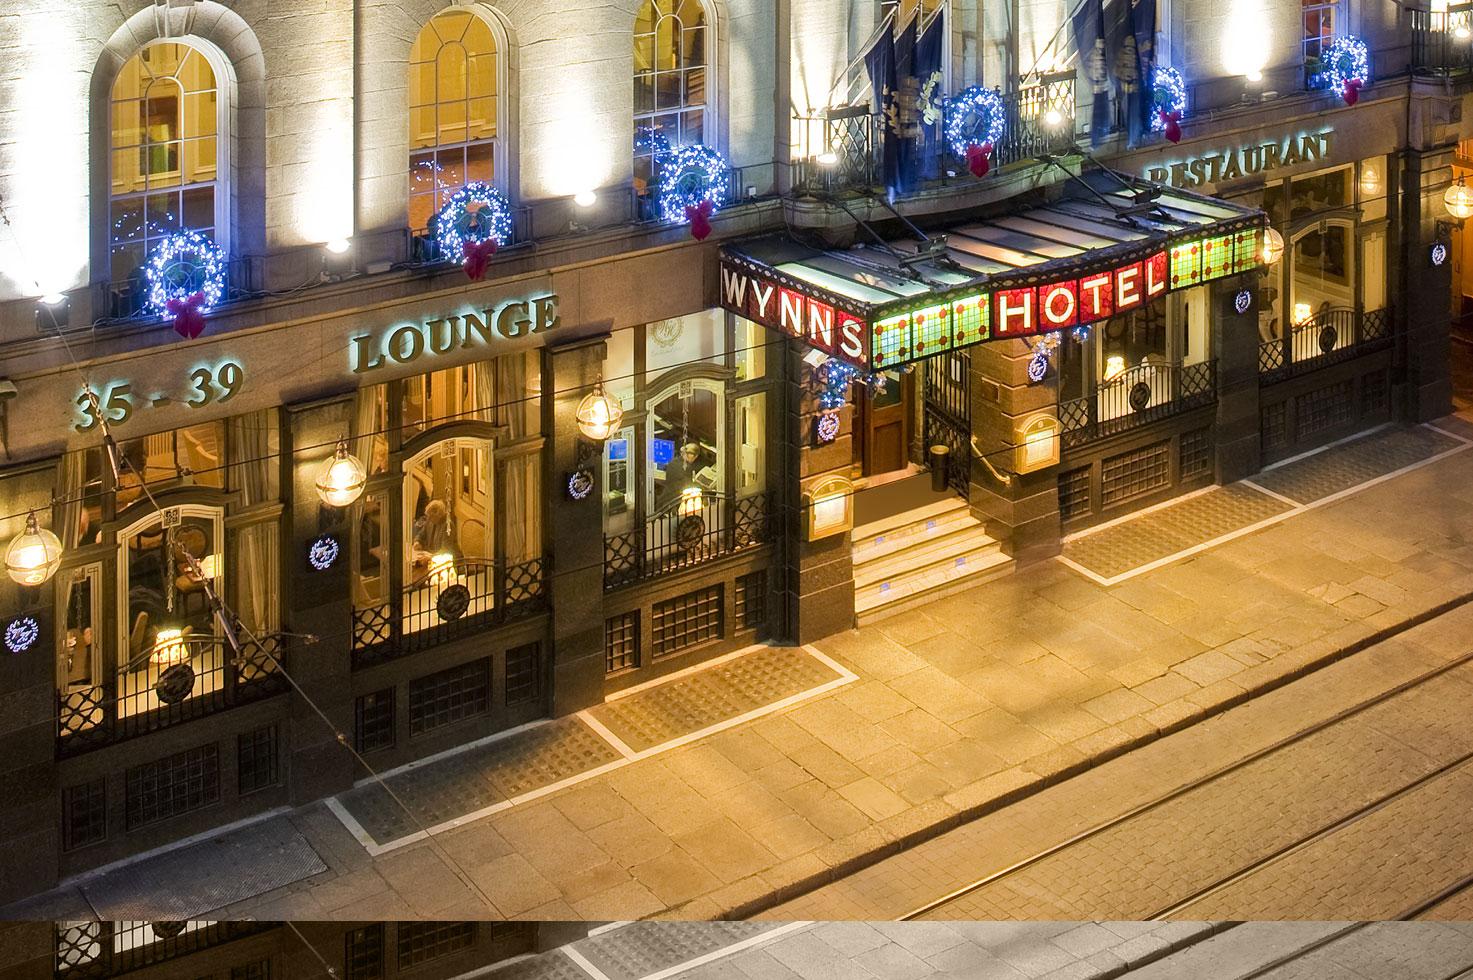 Wynn's Hotel, Dublin Review